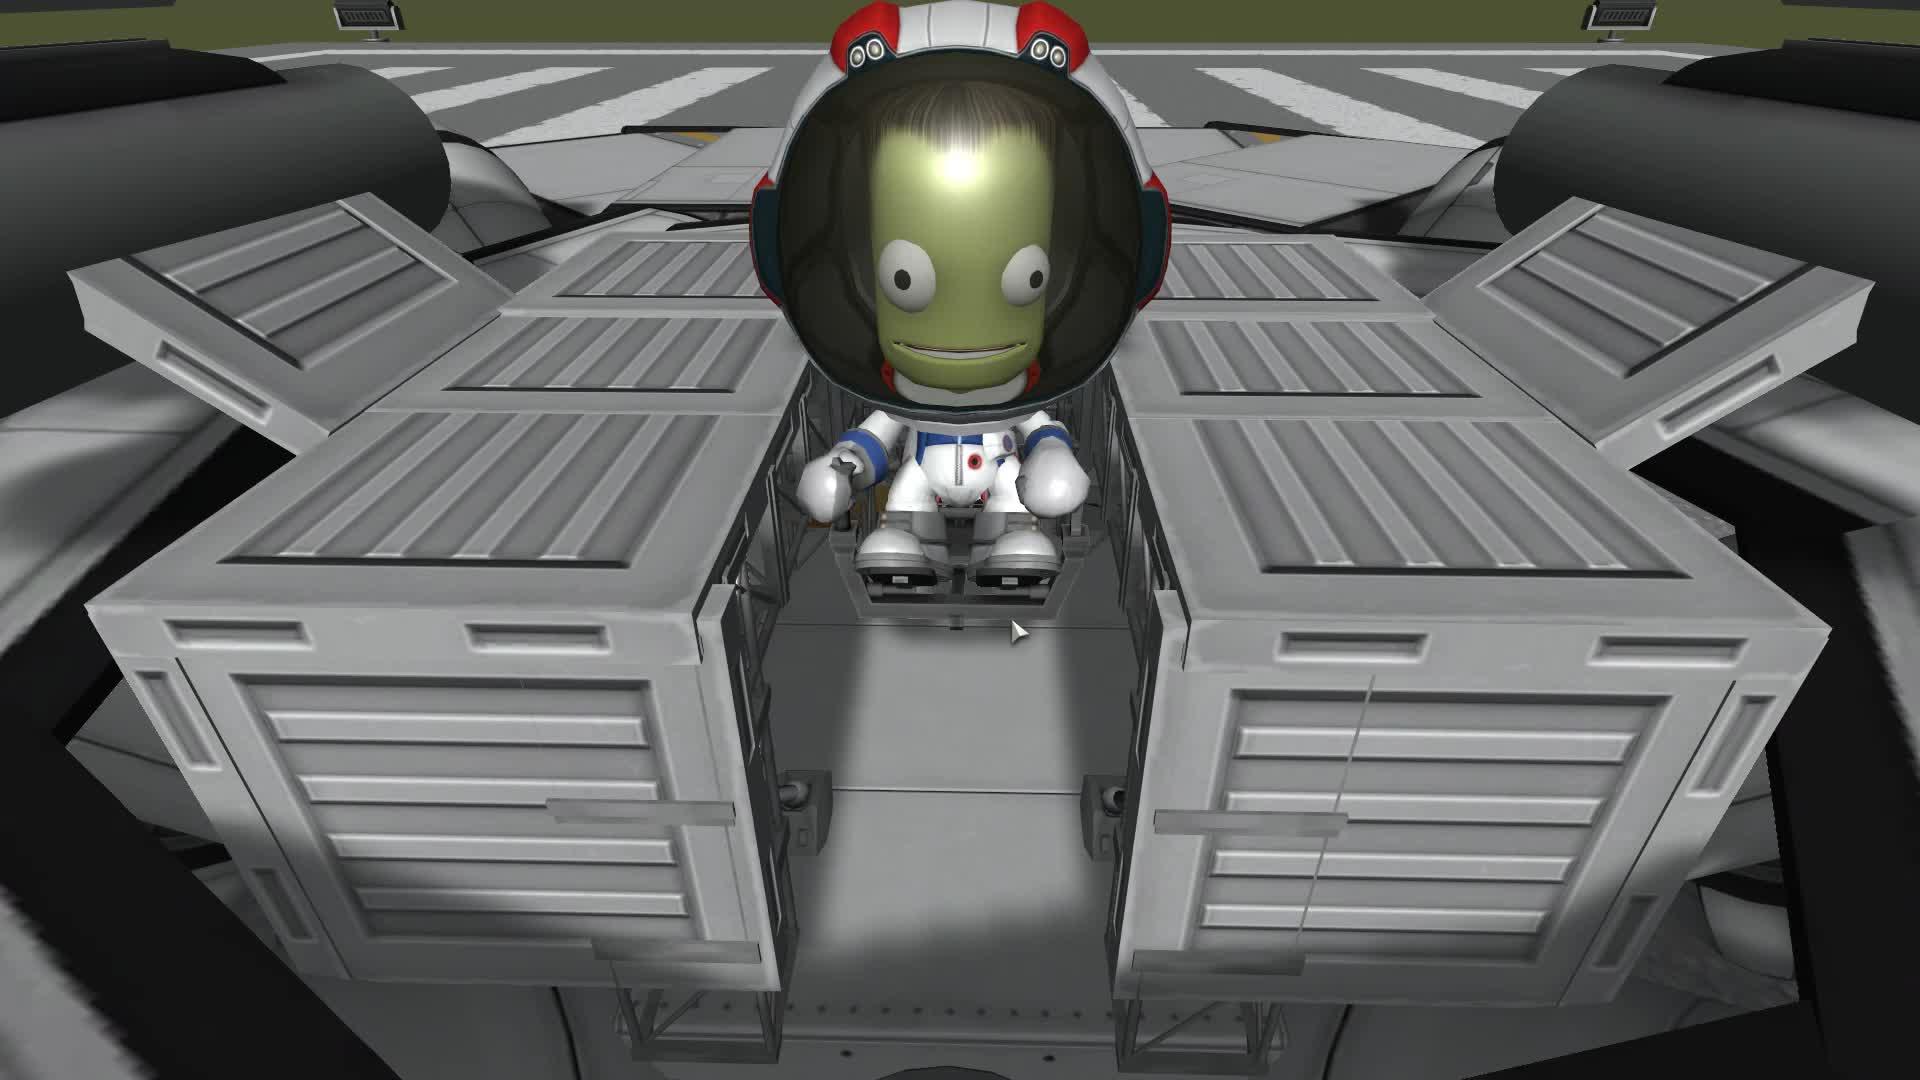 UFOAttack GIFs